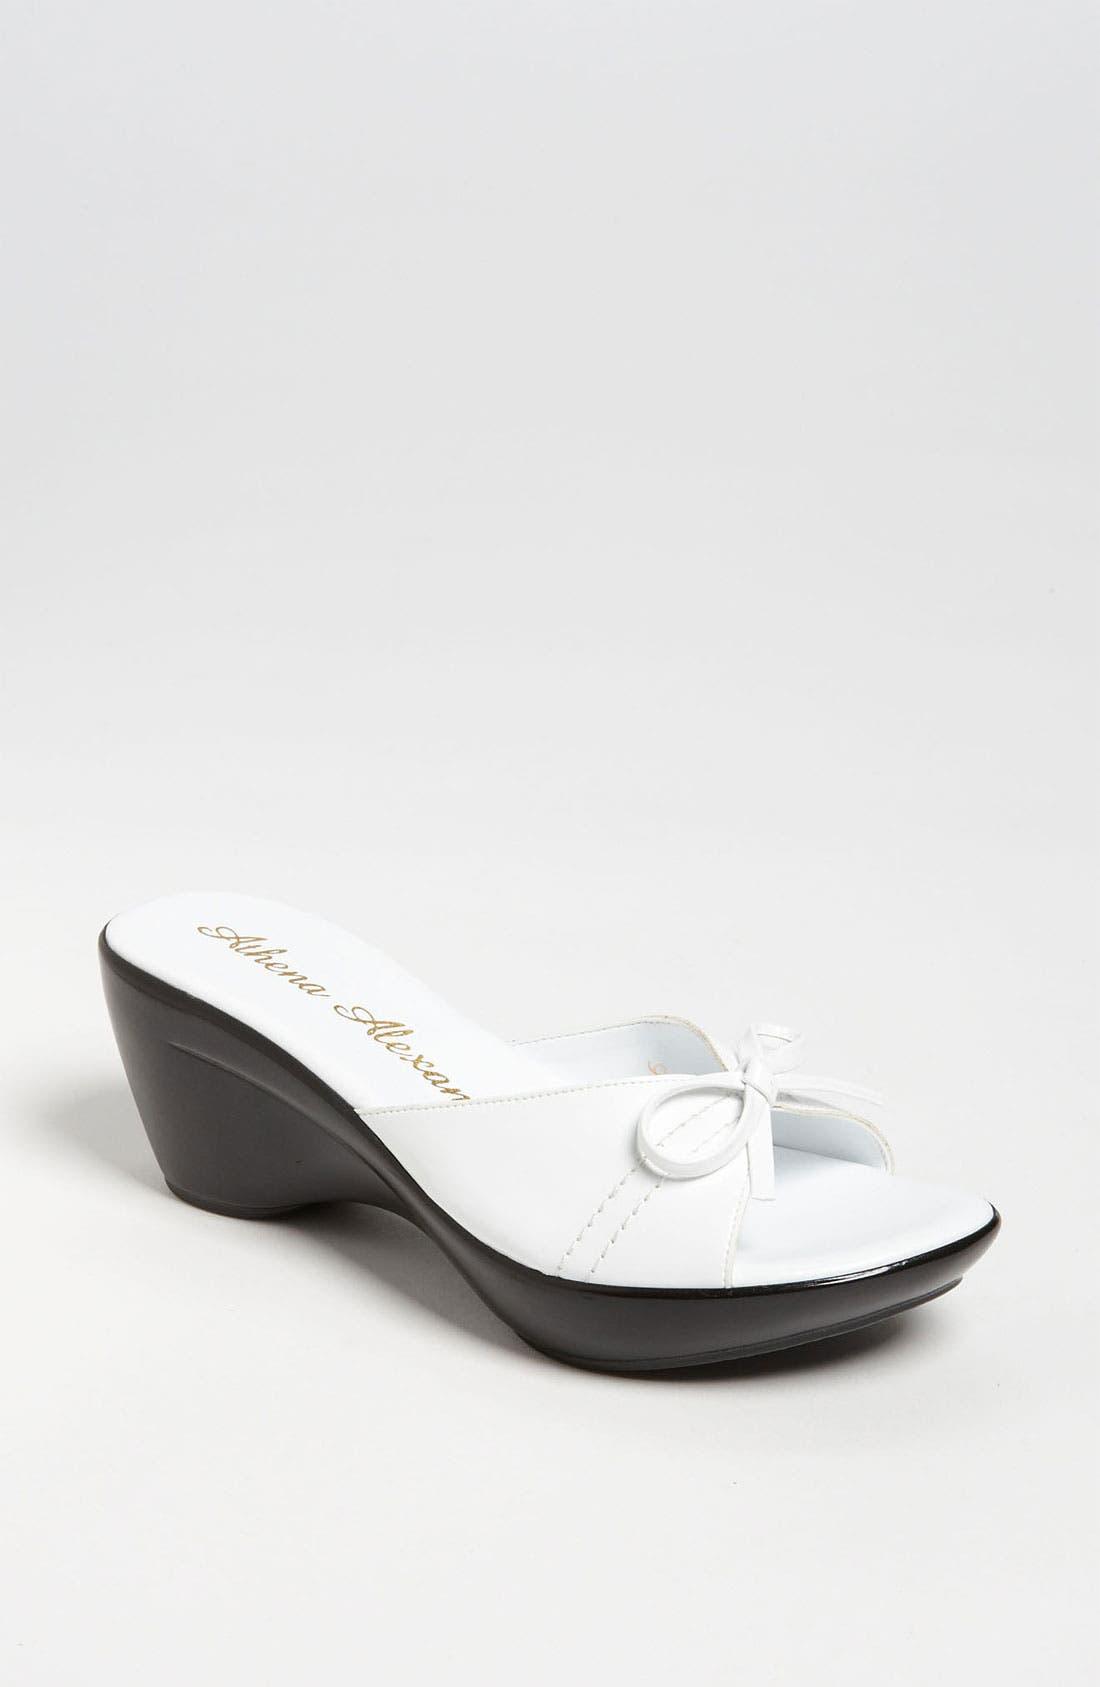 Alternate Image 1 Selected - Athena Alexander 'Jordan' Sandal (Special Purchase)